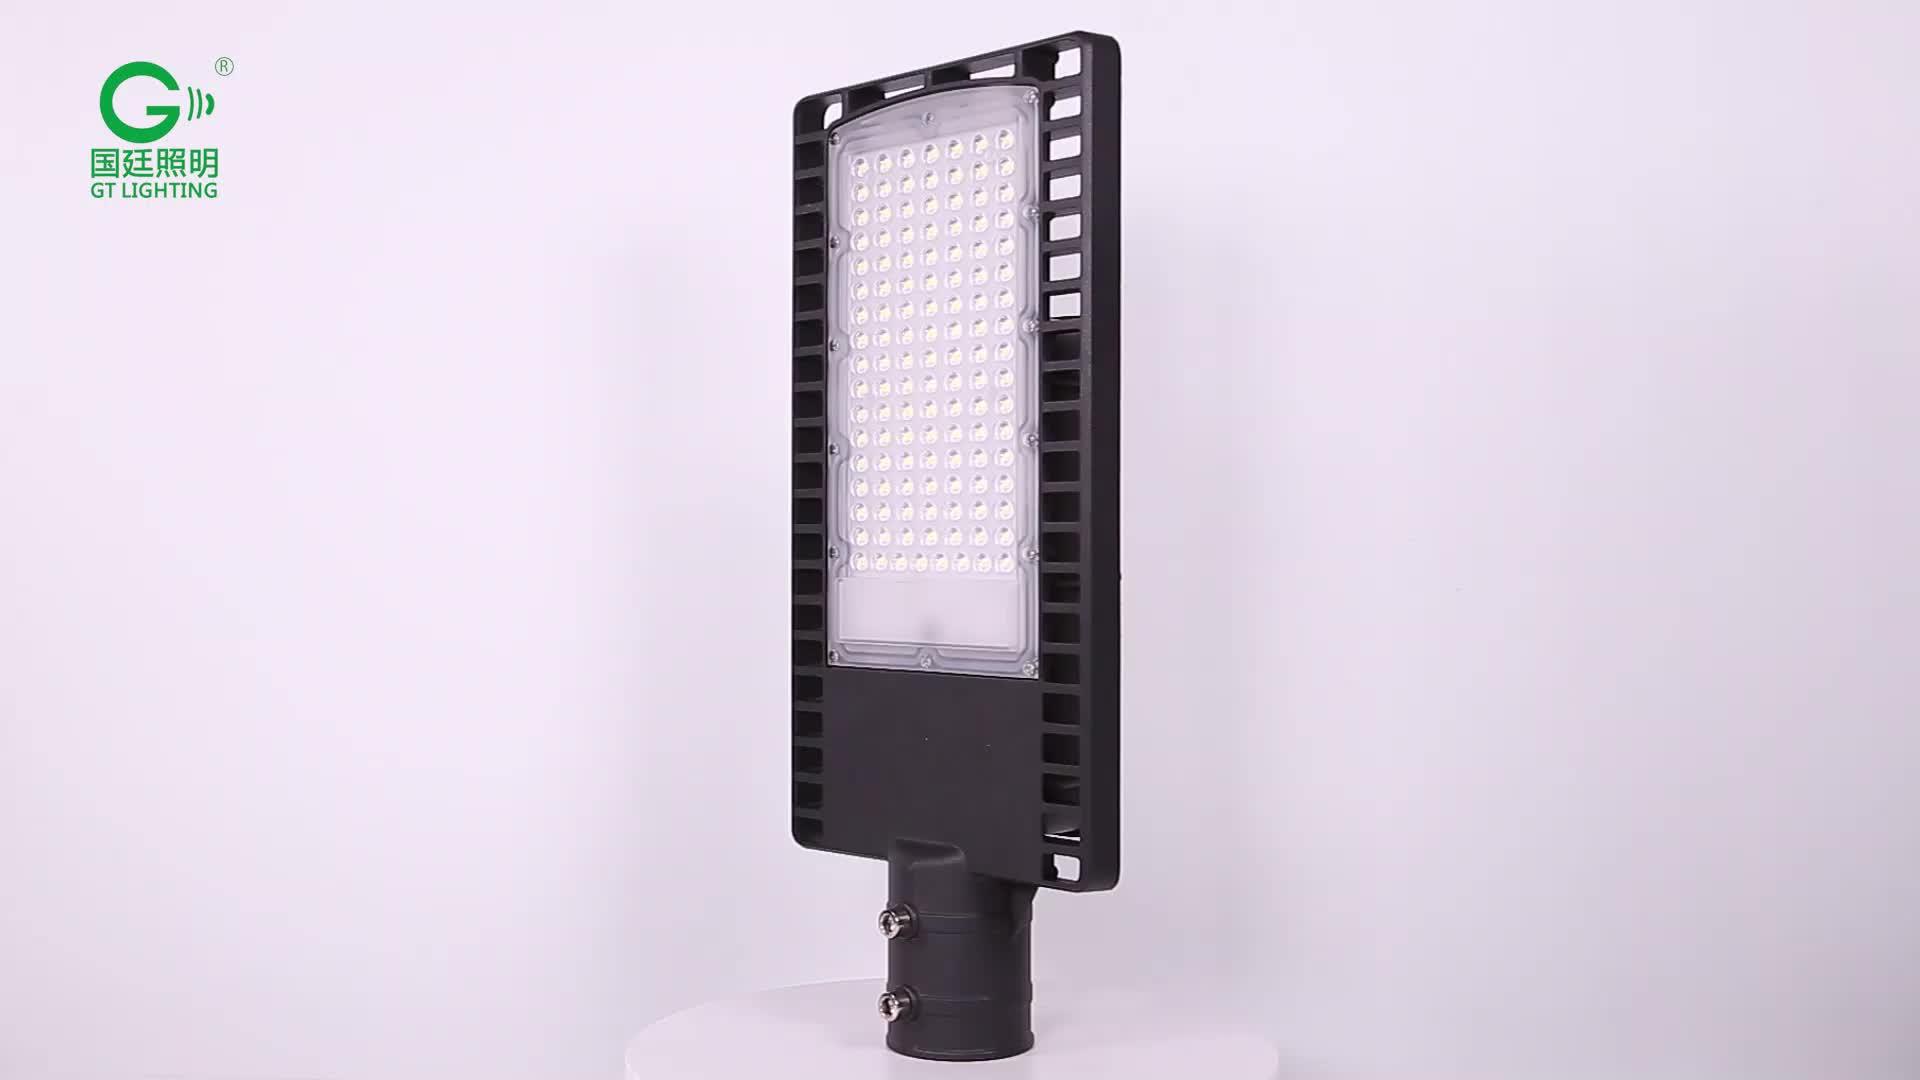 GT High brightness higway waterproof ip66 SMD 60w outdoor solar led streetlight